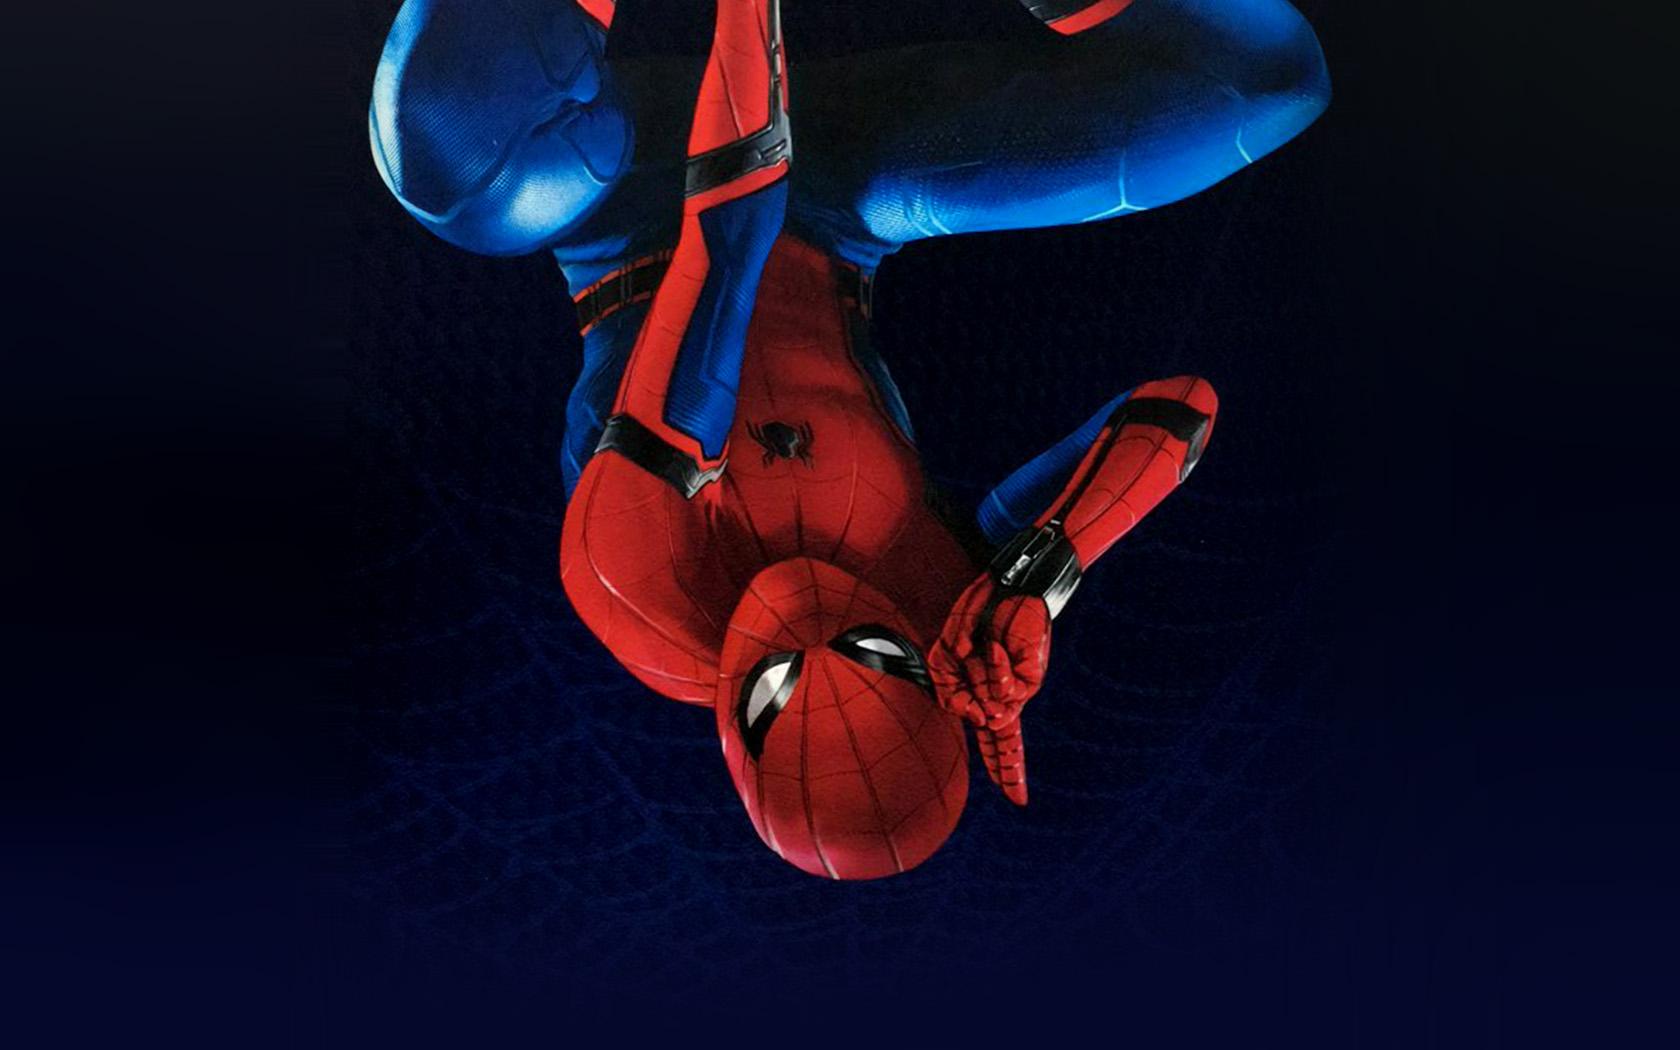 Spiderman Hd Wallpaper Wallpaper For Desktop Laptop Az61 Spiderman Homecoming